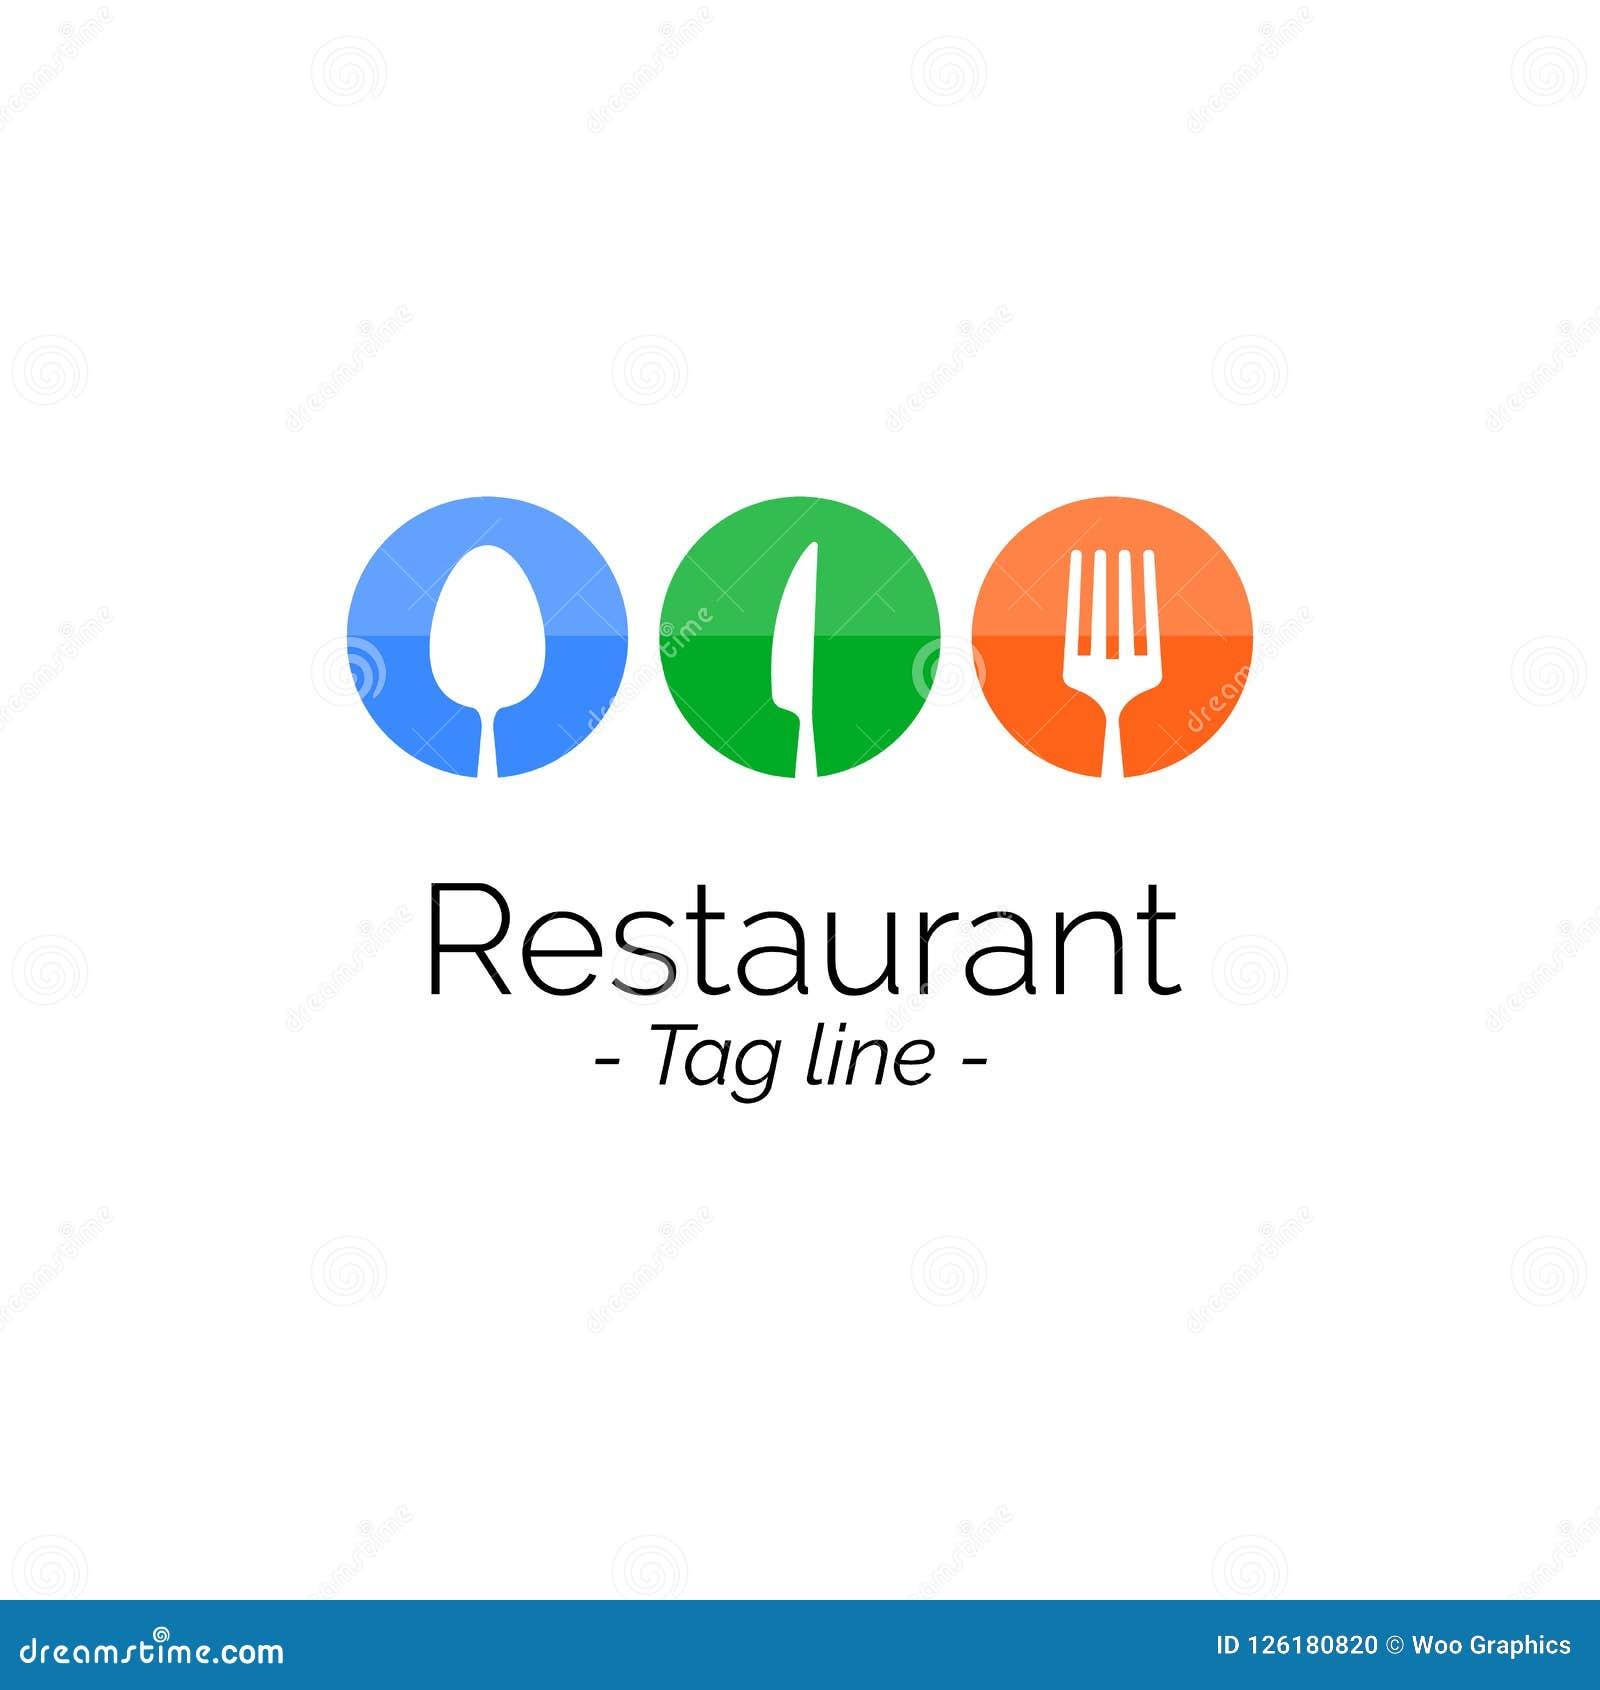 Restaurant Logo icon flat design, Vector illustration bannerRestaurant Logo icon flat design inspiration, Vector illustration bann